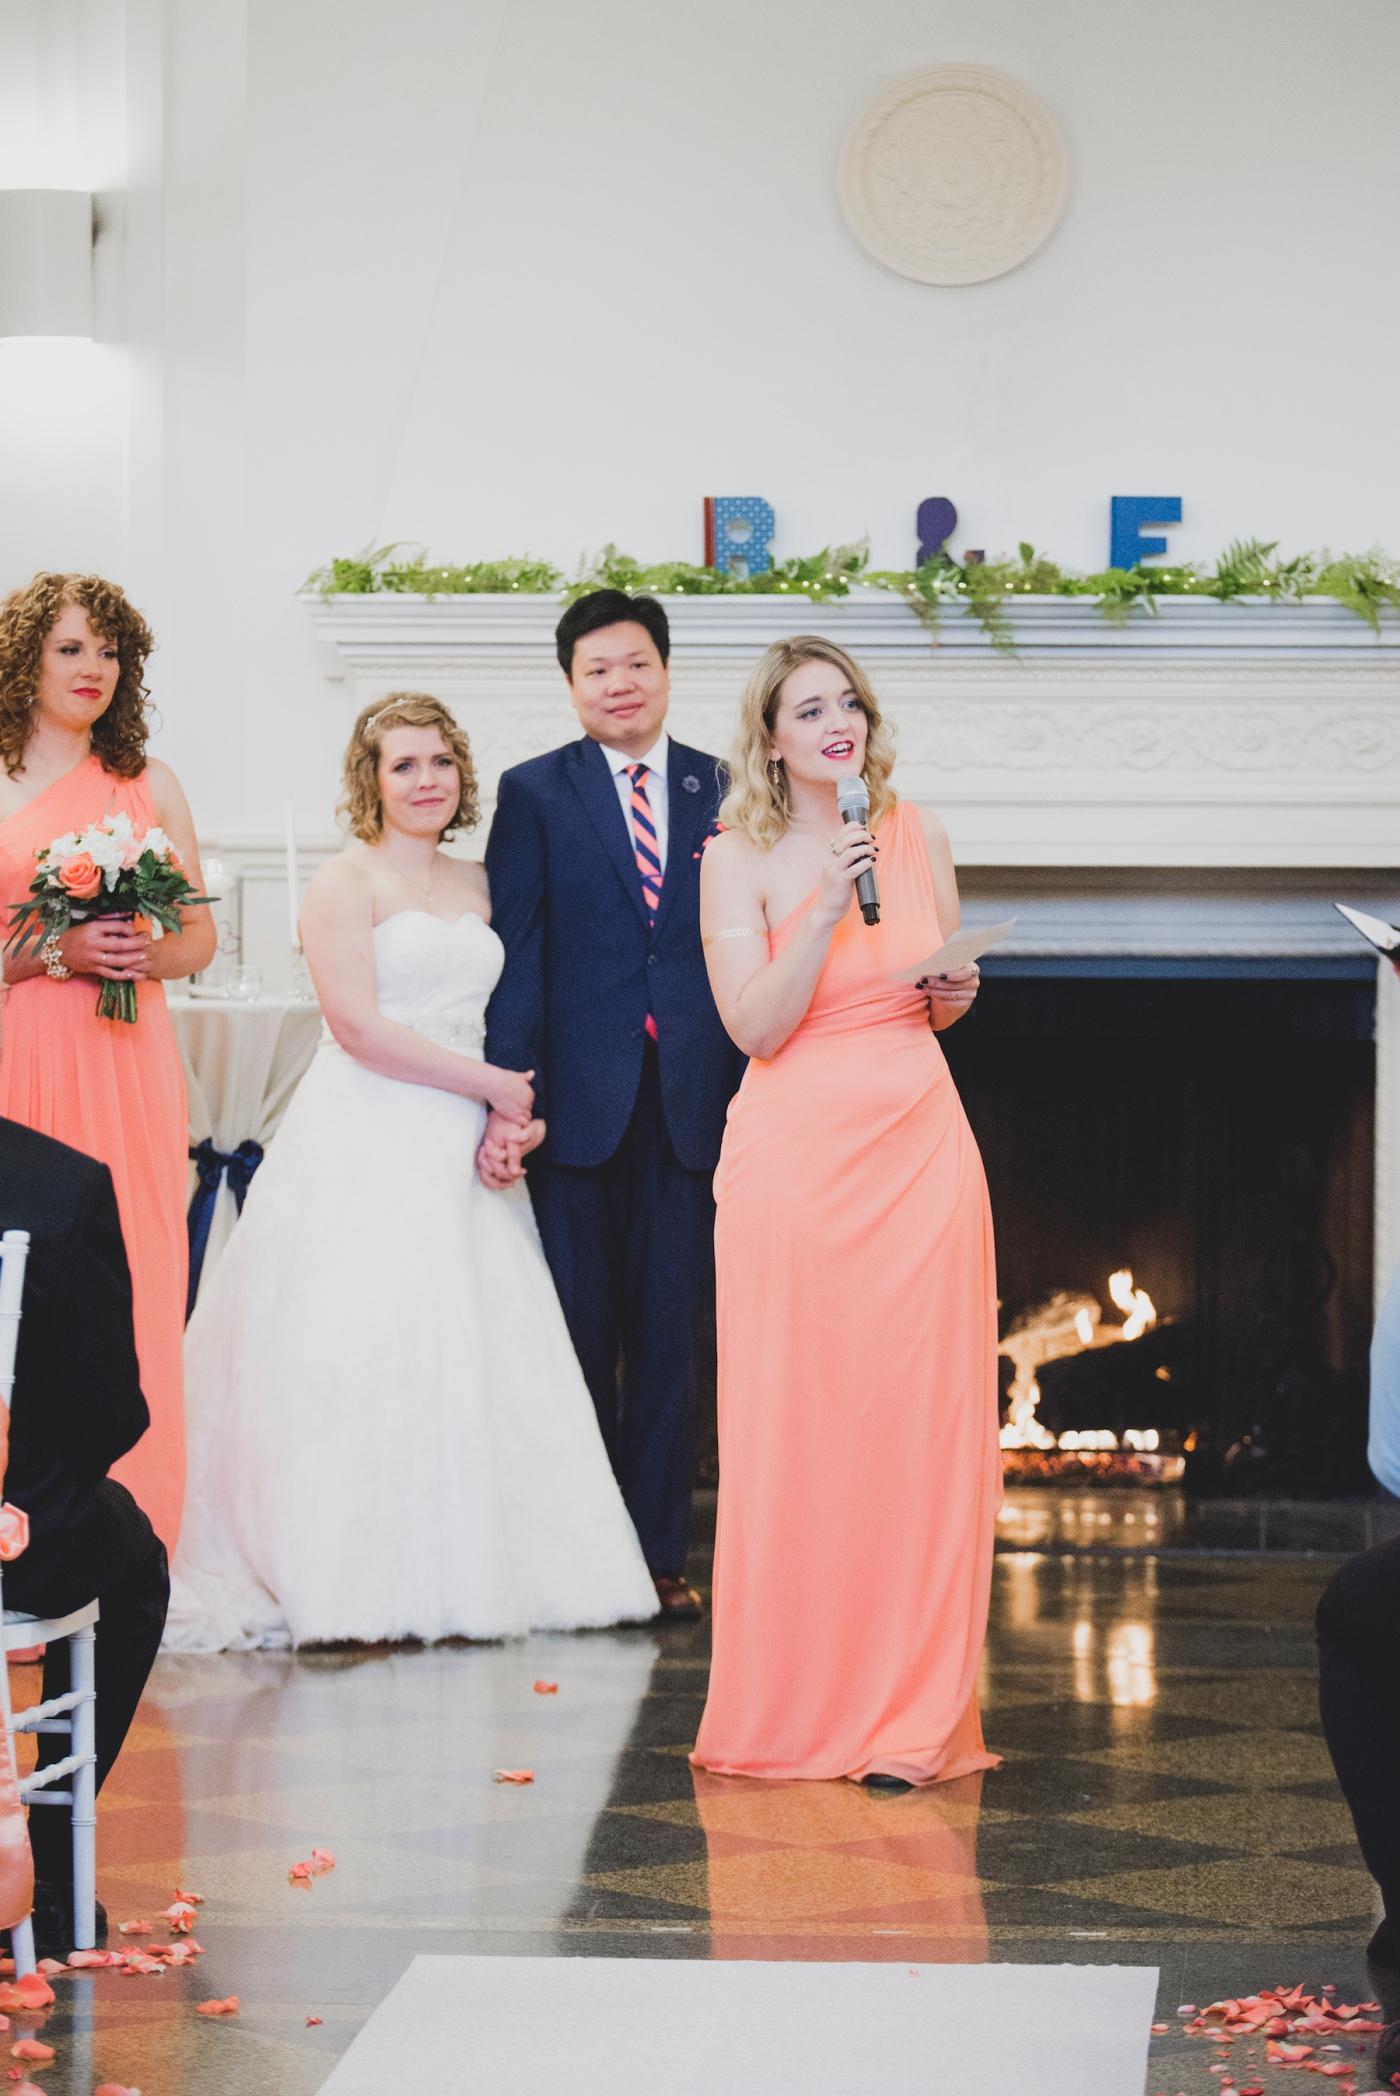 DSC_2706Everett_Wedding_Ballroom_Jane_Speleers_photography_Rachel_and_Edmund_Ceremony_2017